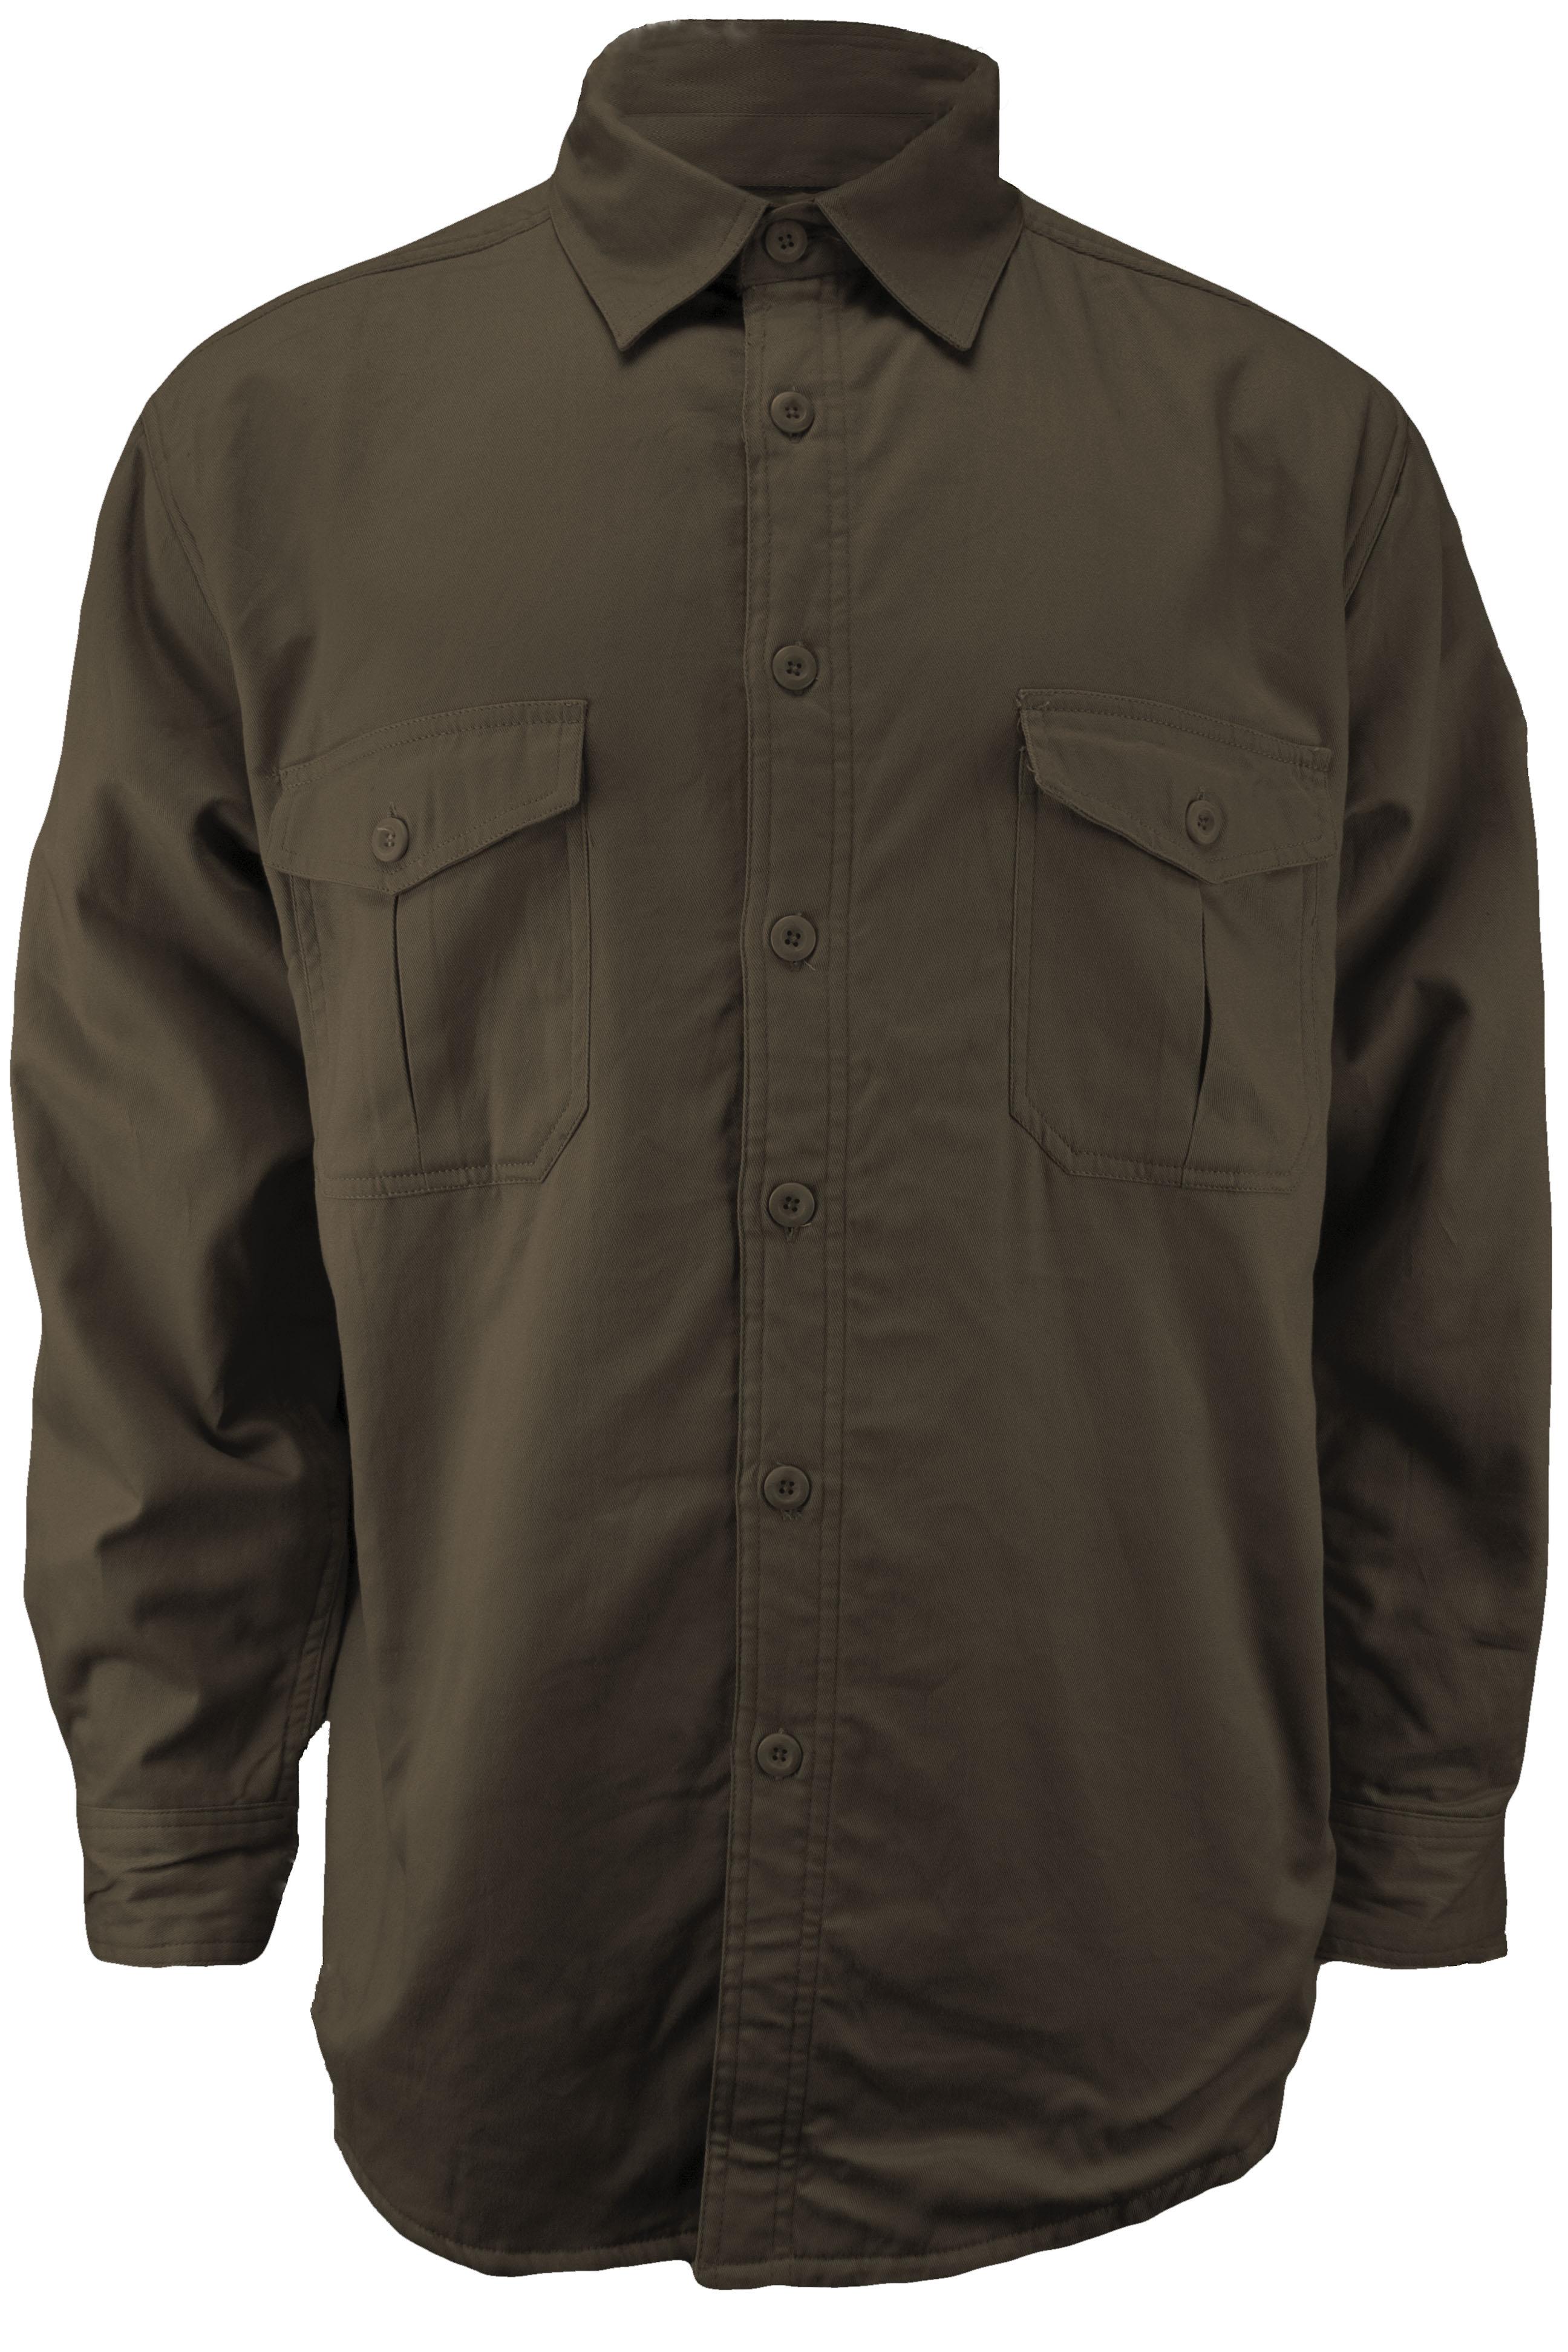 Mens Micro Fleece Lined Button Up Canvas Shirt Ebay